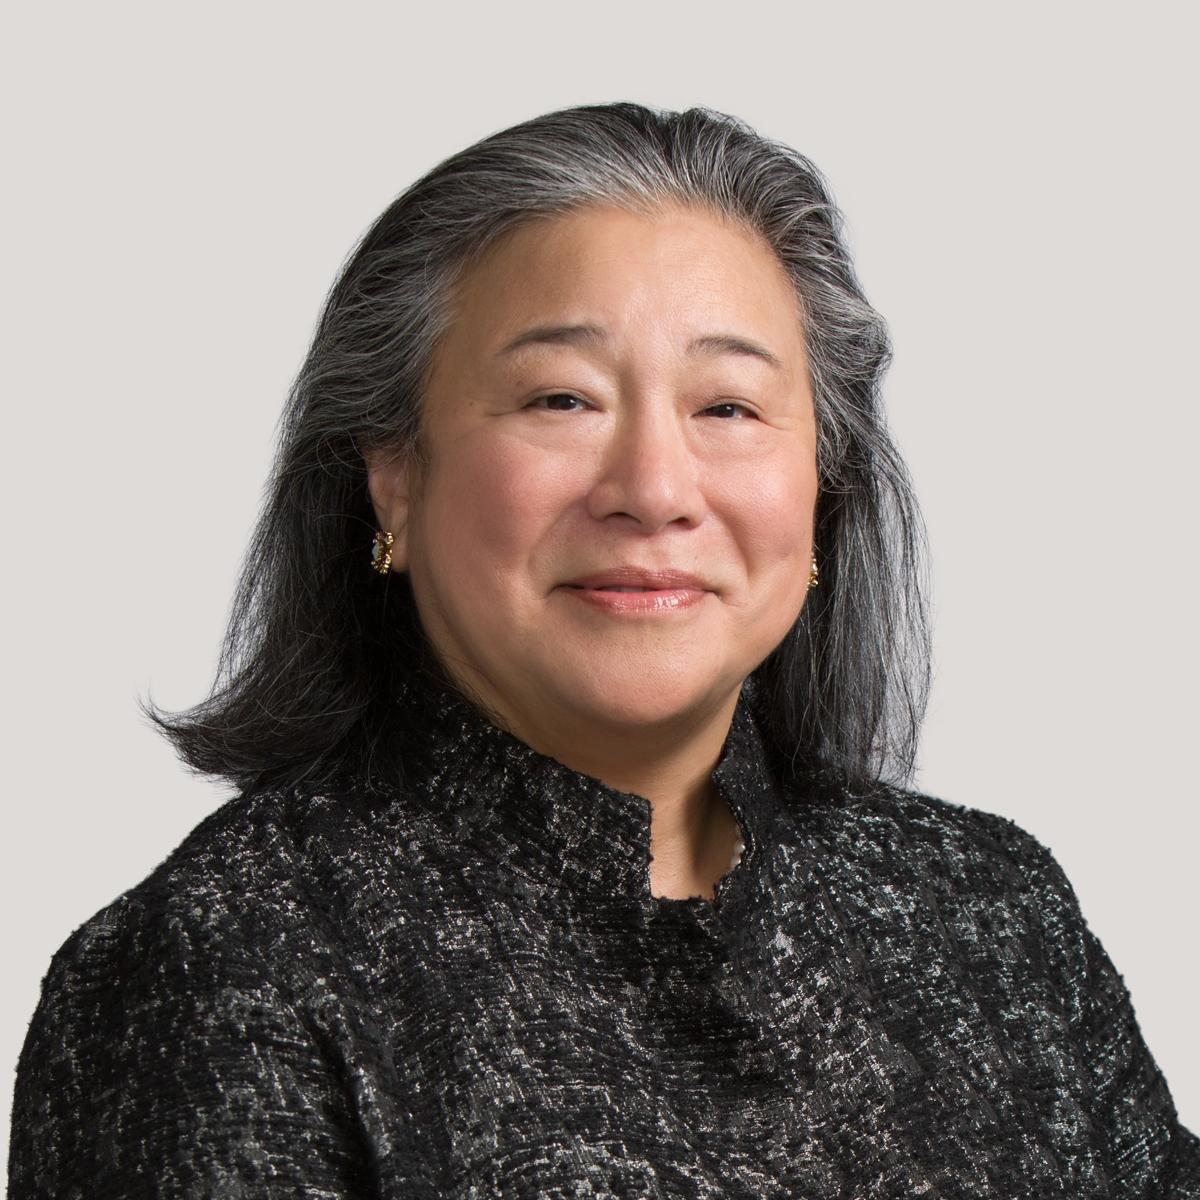 Episode 93: Tina M. Tchen